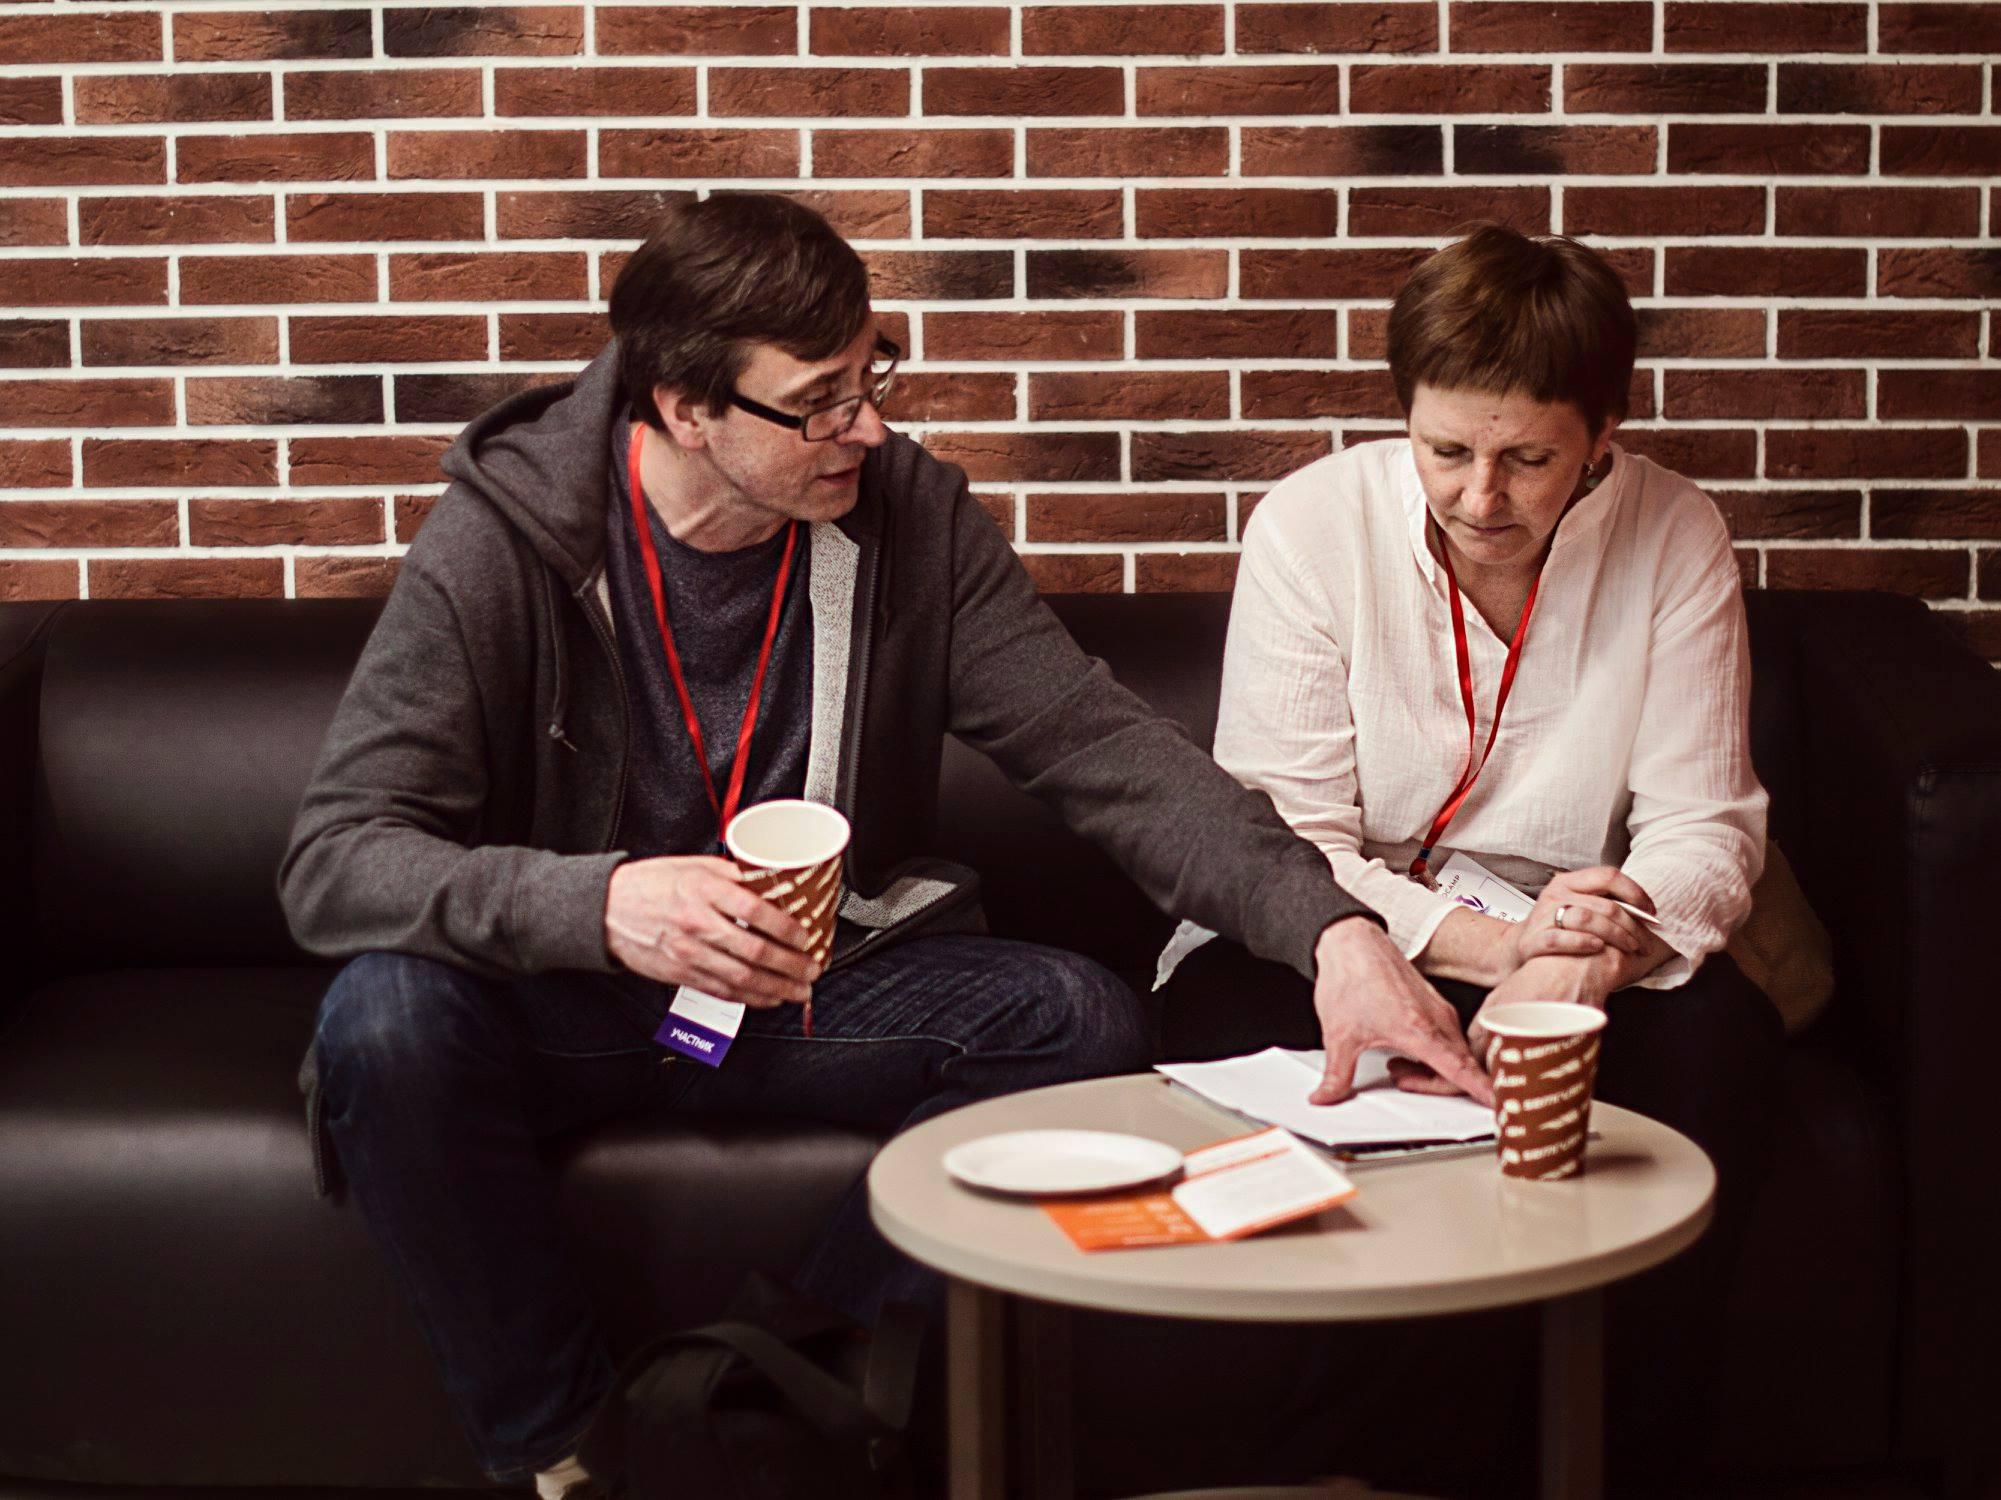 Денис Курепин и Лариса Дробот придумали ЧЕХОВ.today